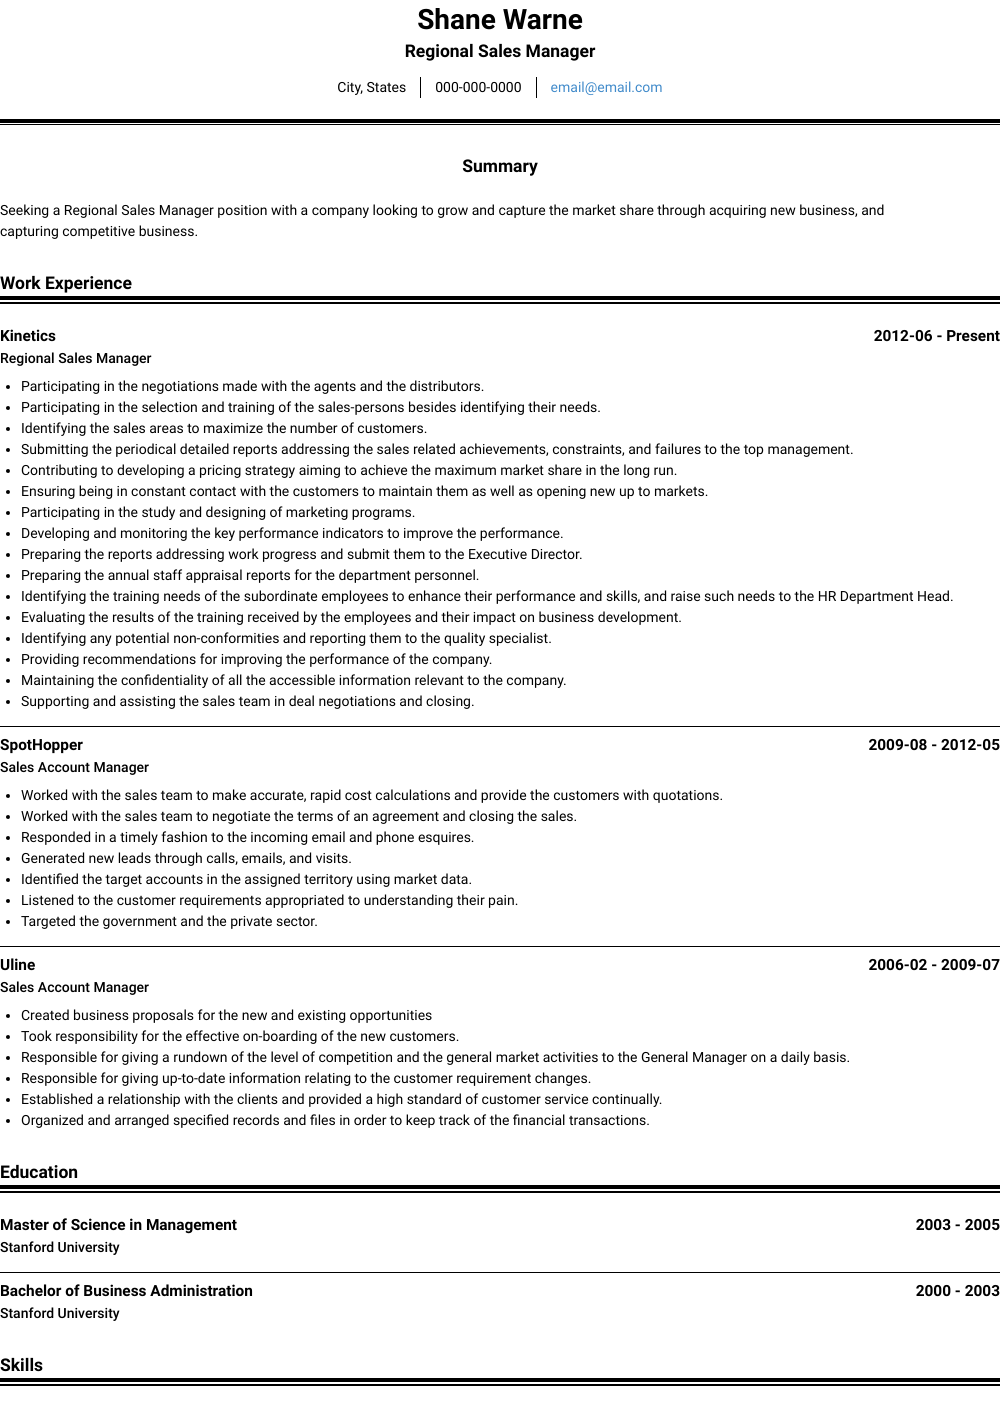 sample resume regional sales manager pharma